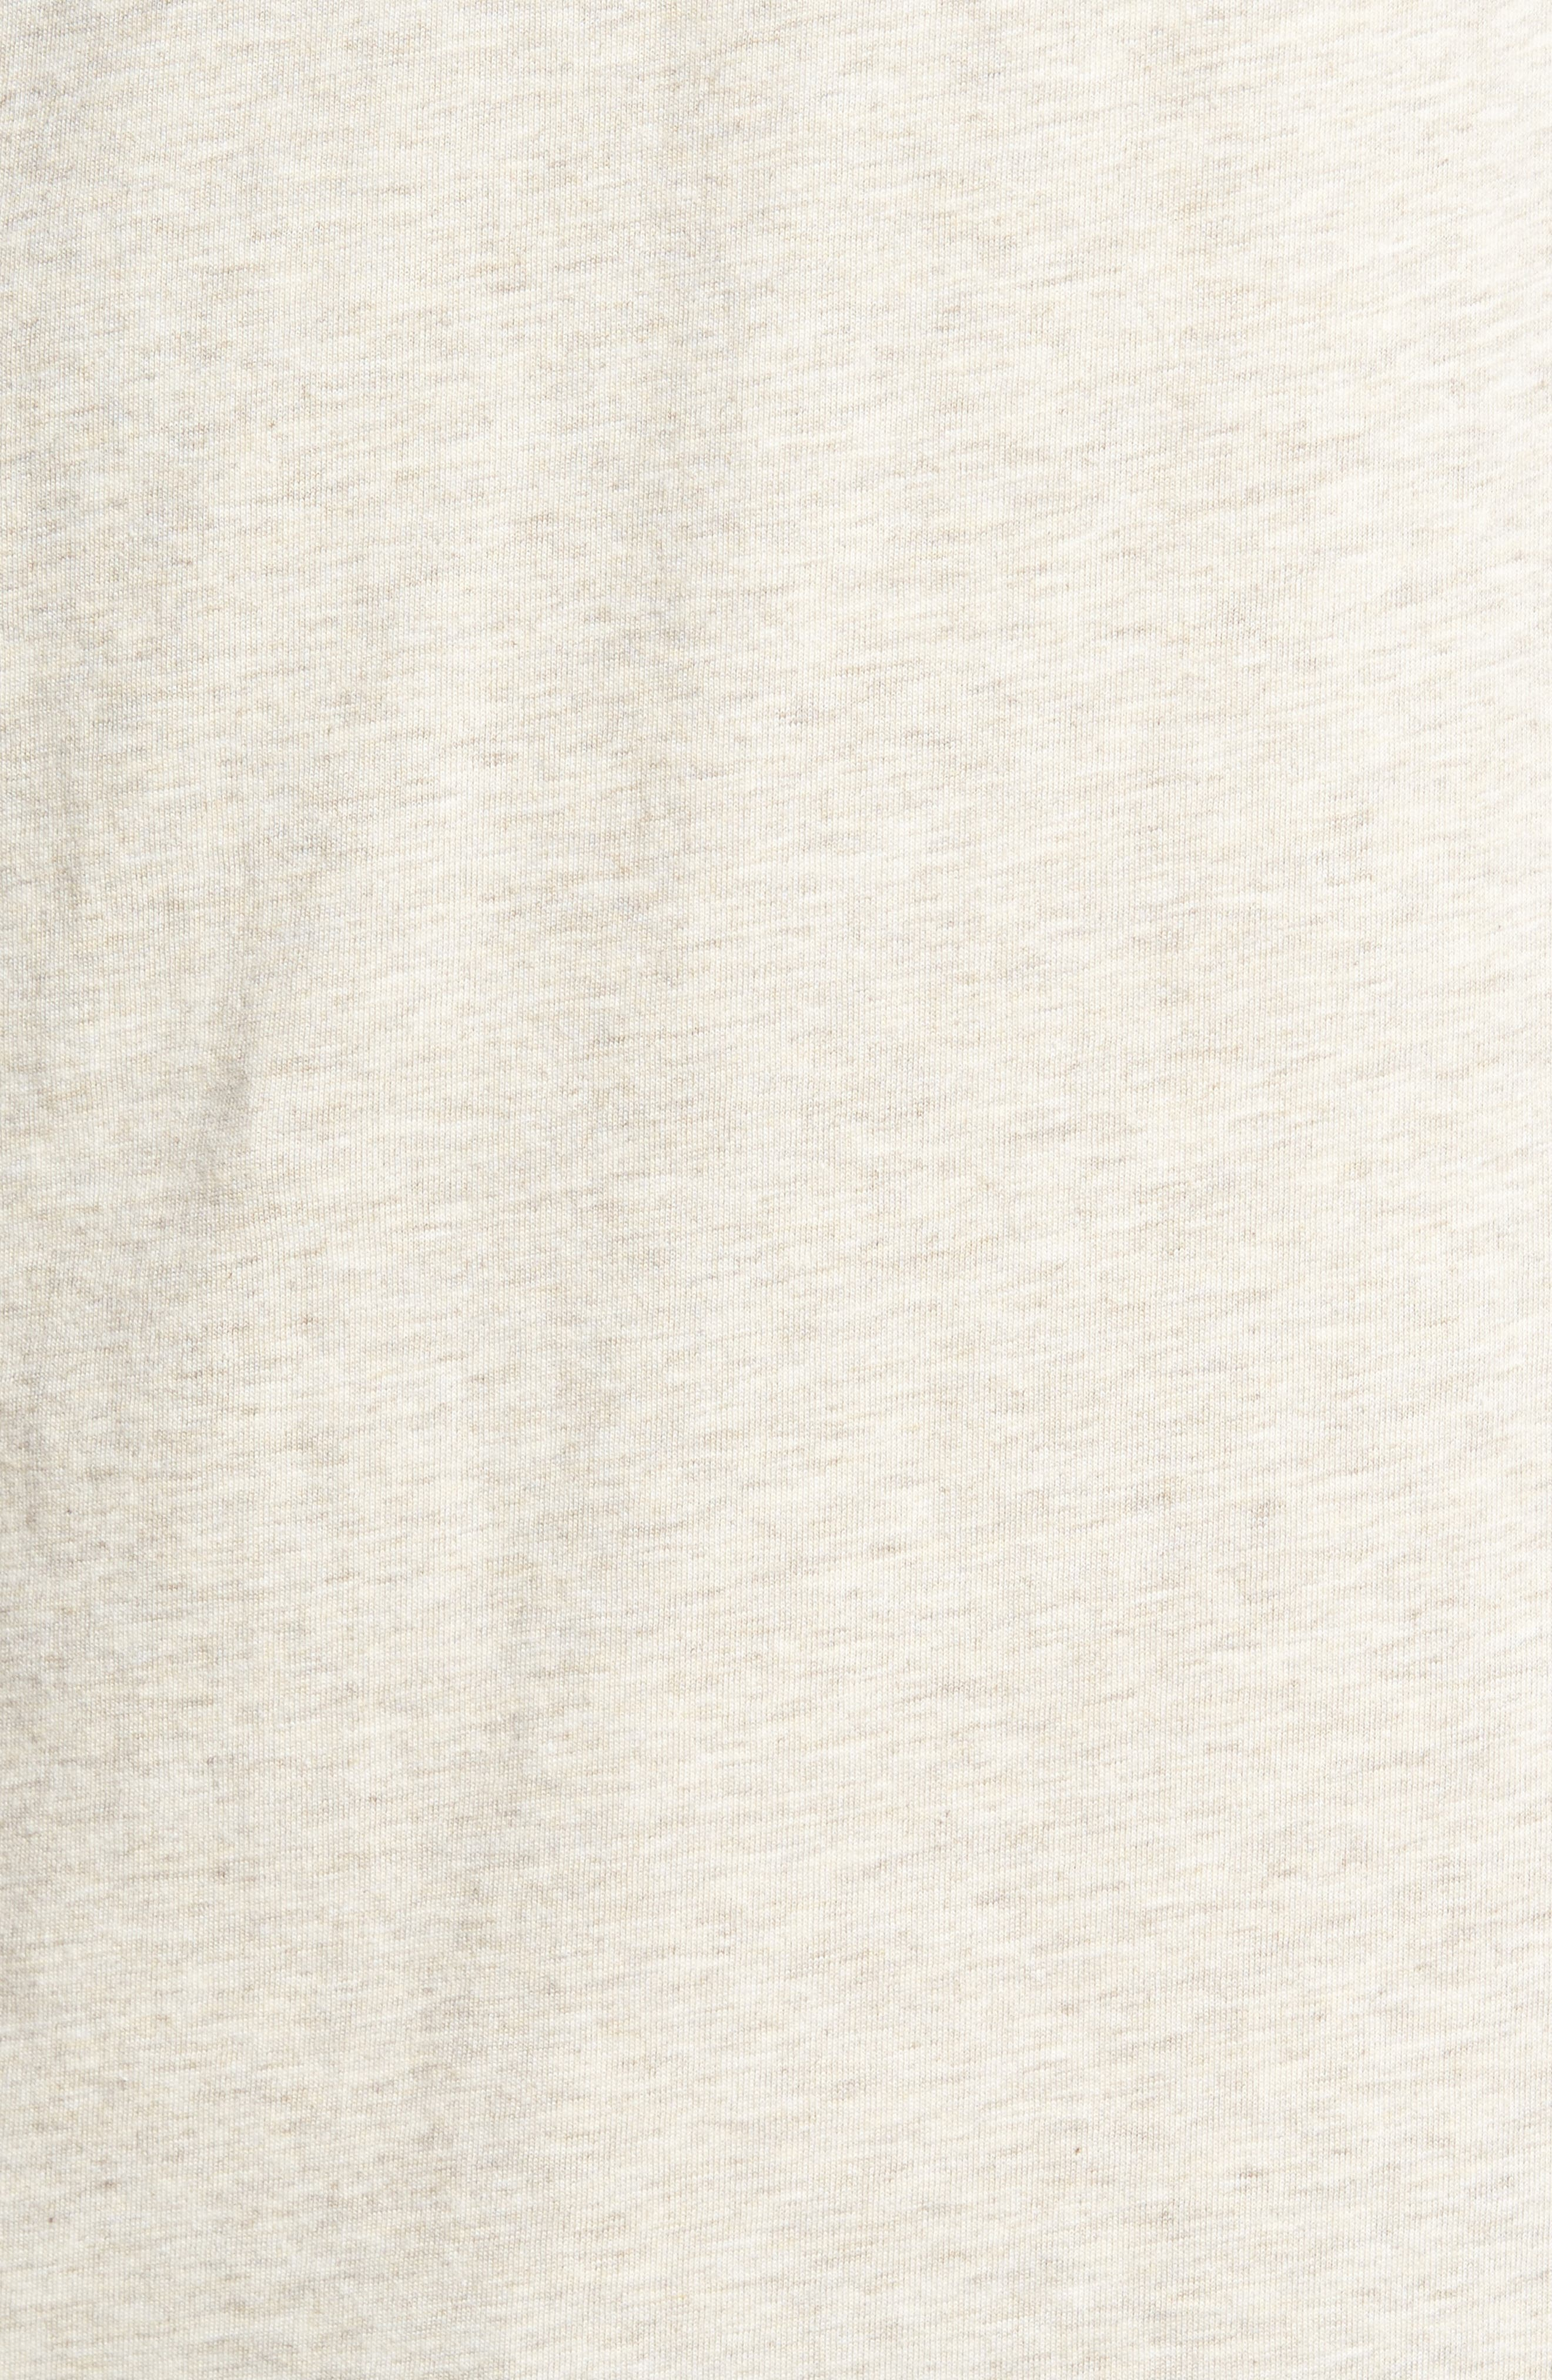 'Daily' Long Sleeve Organic Cotton Henley,                             Alternate thumbnail 5, color,                             BIRCH WHITE